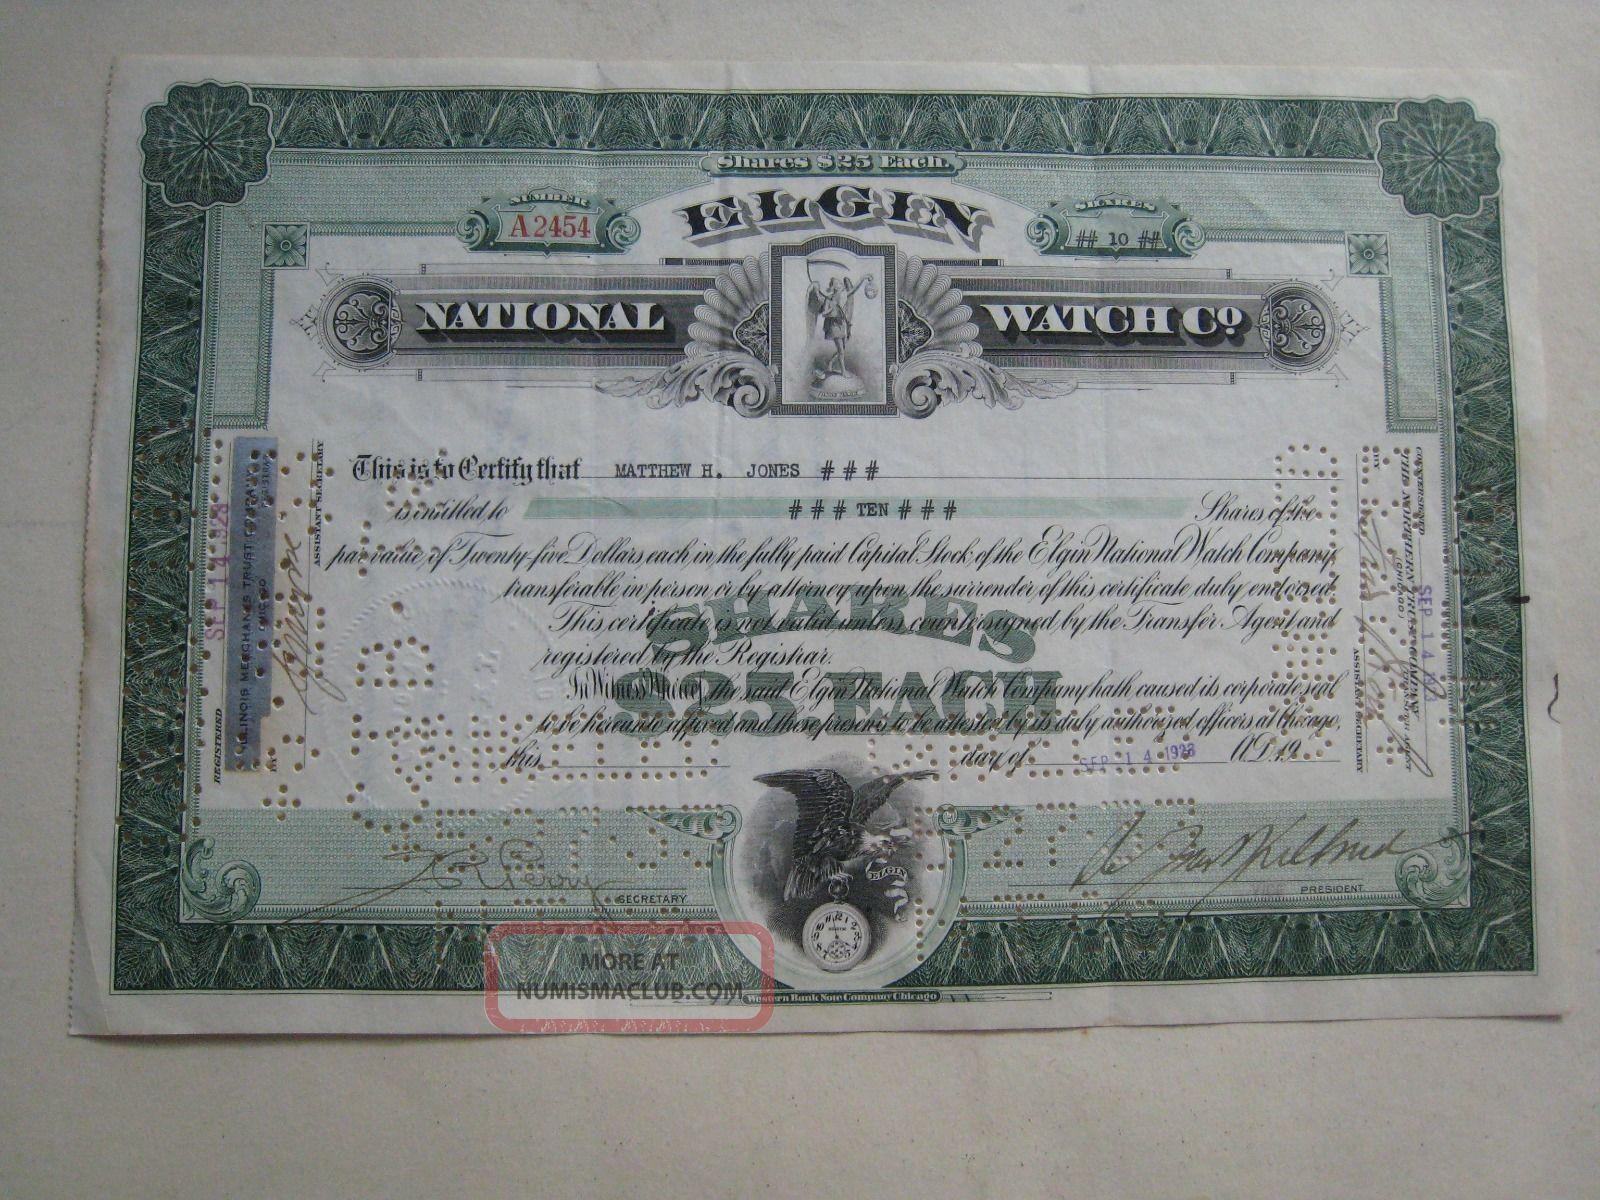 Elgin National Watch Company Stock Certificate Stocks & Bonds, Scripophily photo